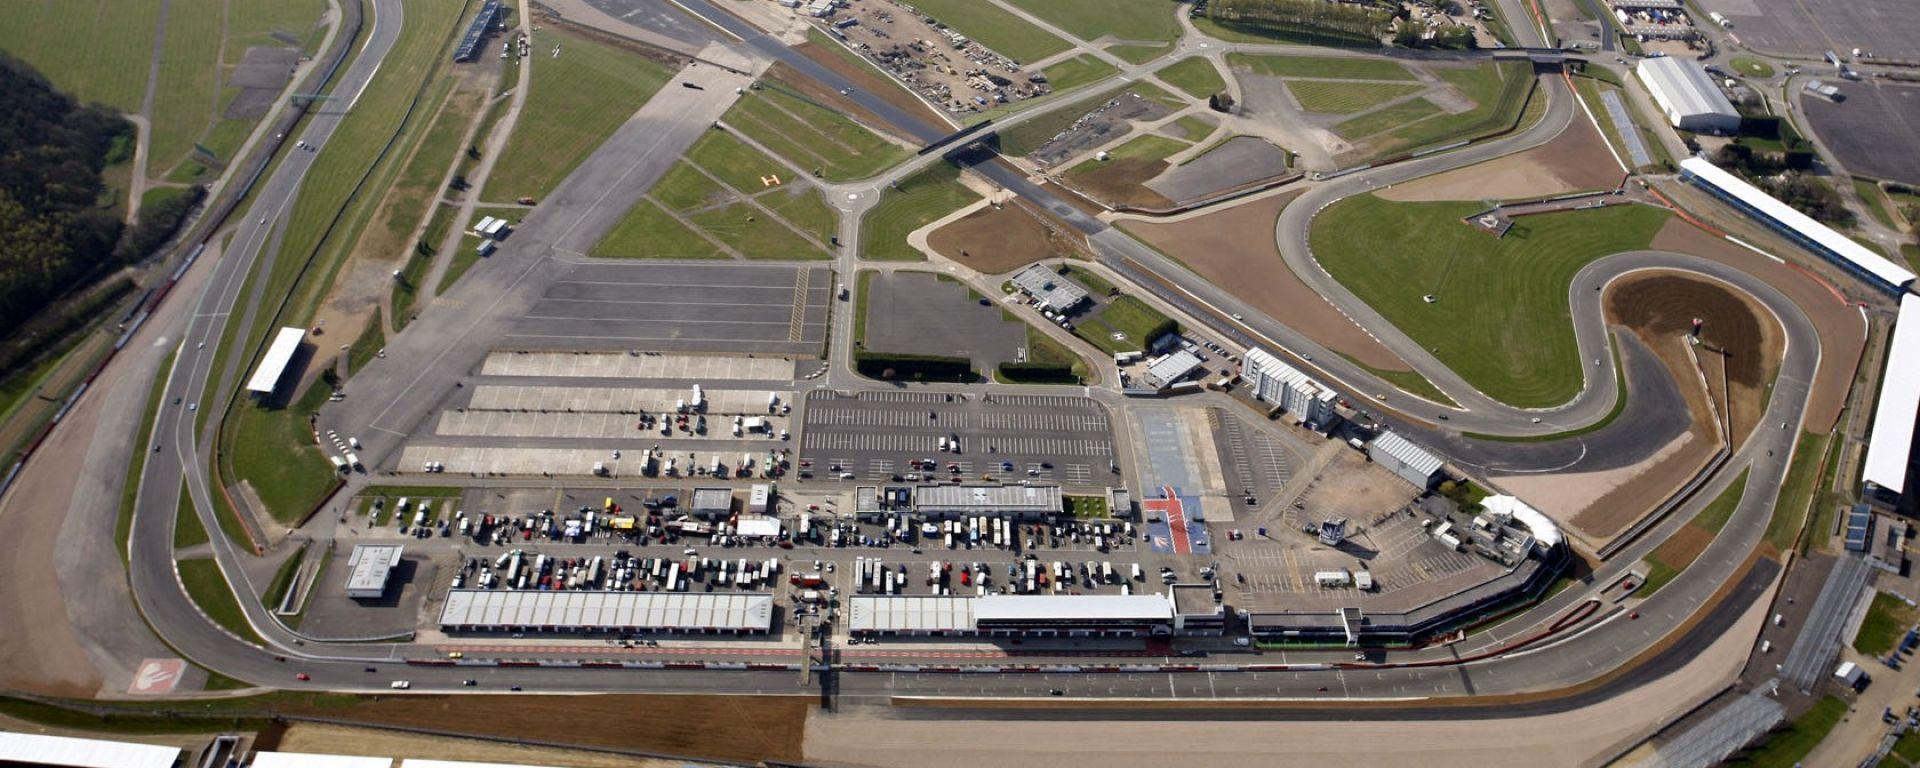 MotoGP Silverstone Inghilterra: Prove libere, qualifiche, risultati gara